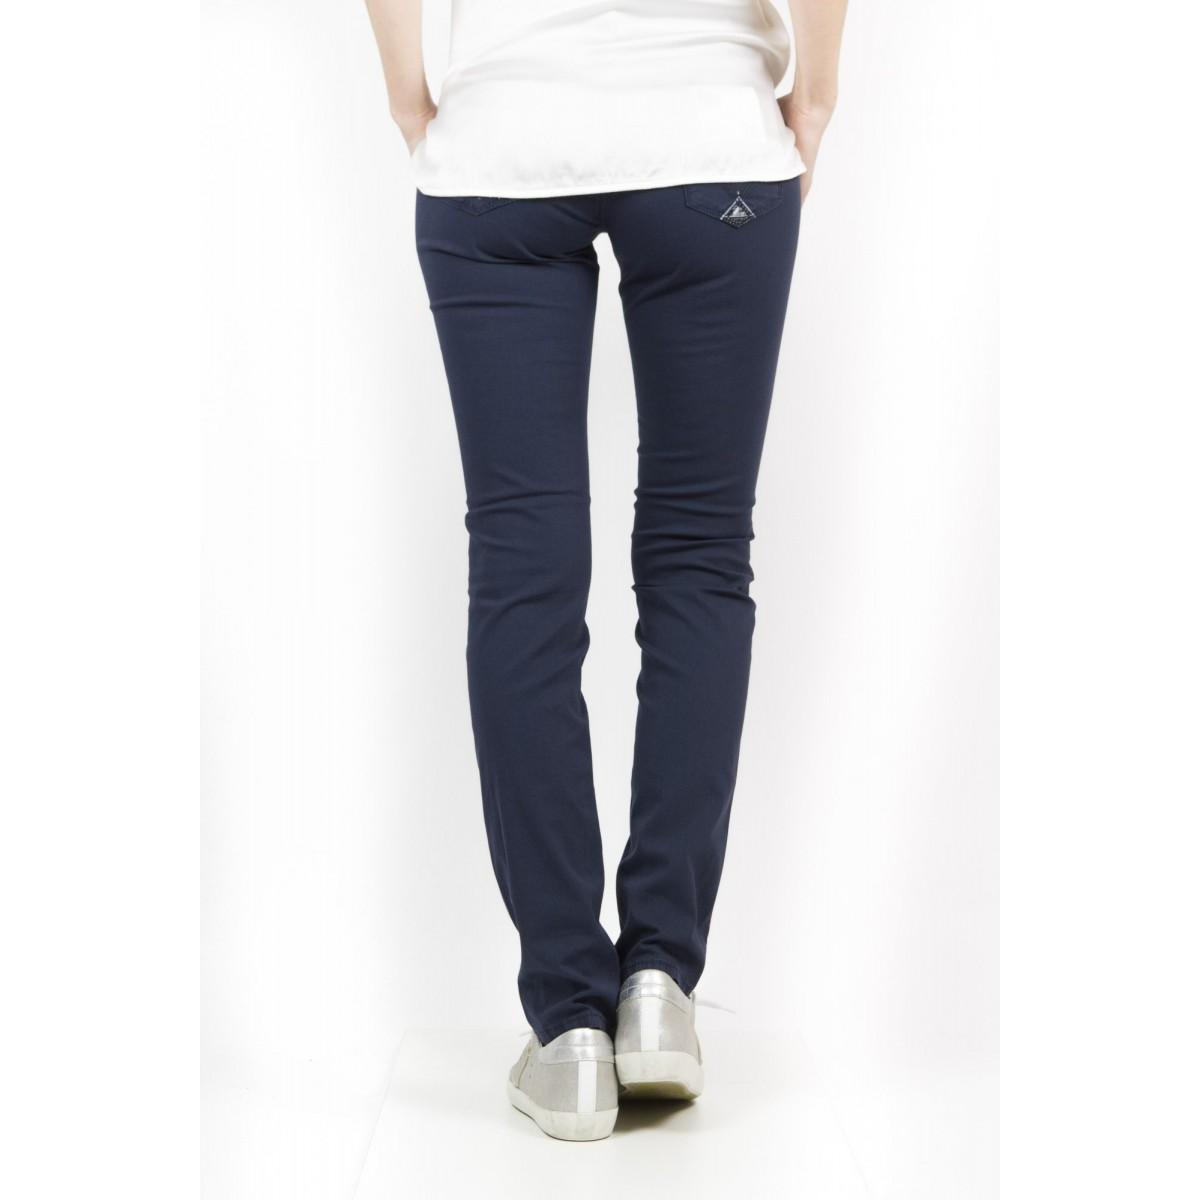 Pantalone donna Roy rogers - Cate gabardina summer strech 001 - blu